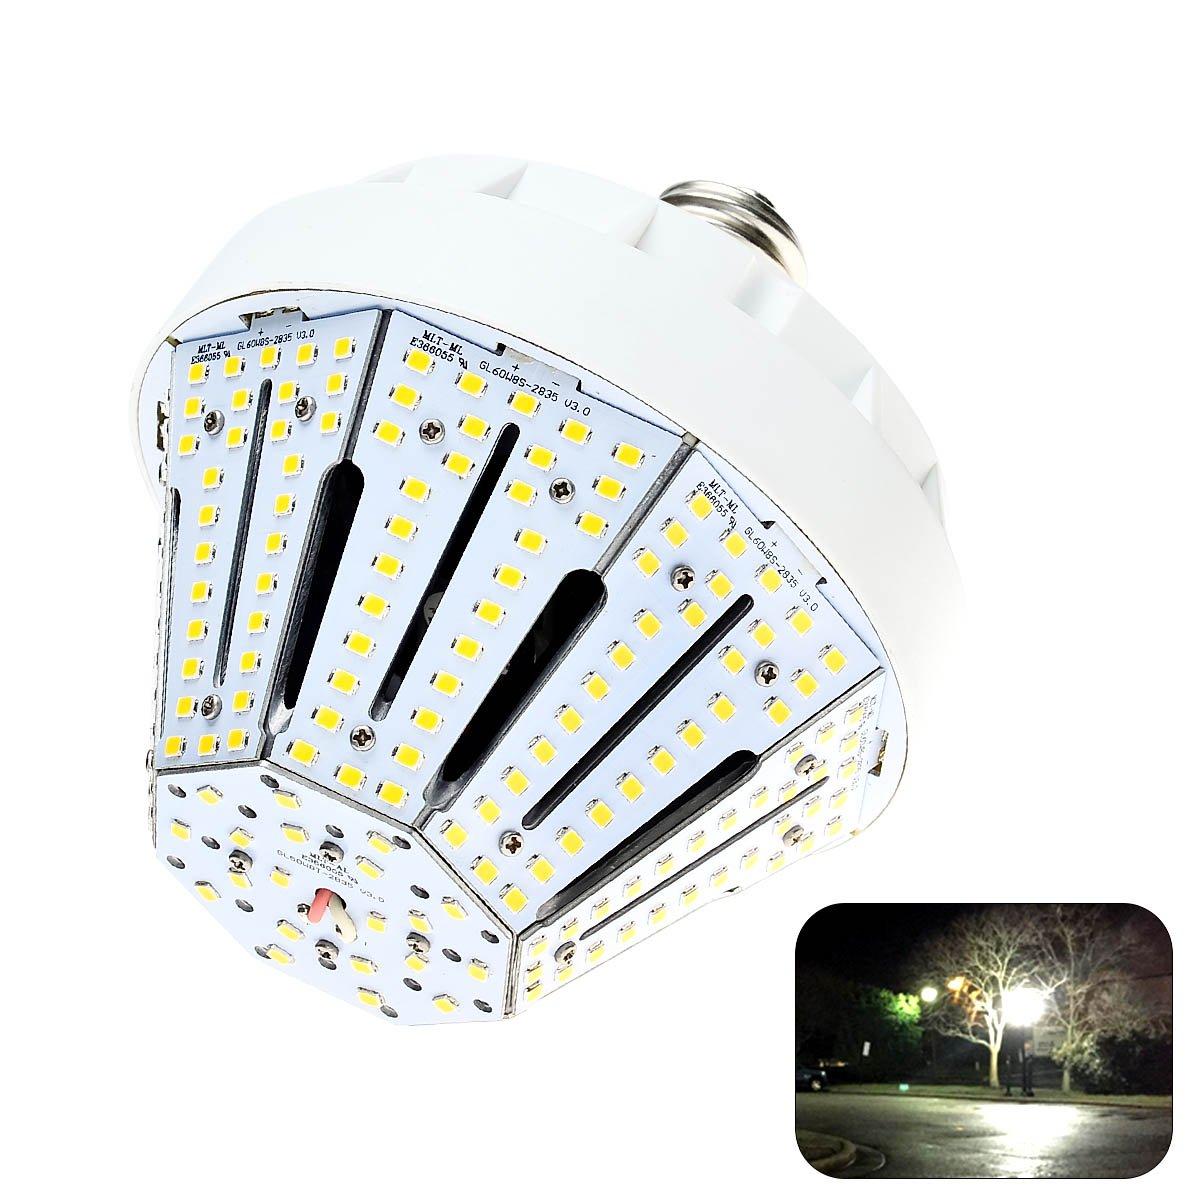 Phenas 50W LED Corn Light Bulbs E26 Base 8500 Lumens 6000K for Street Area Light, Parking Lot, Post Lighting, Gymnasium,Warehouse, Subway, Porch, Backyard, Garden Super Bright